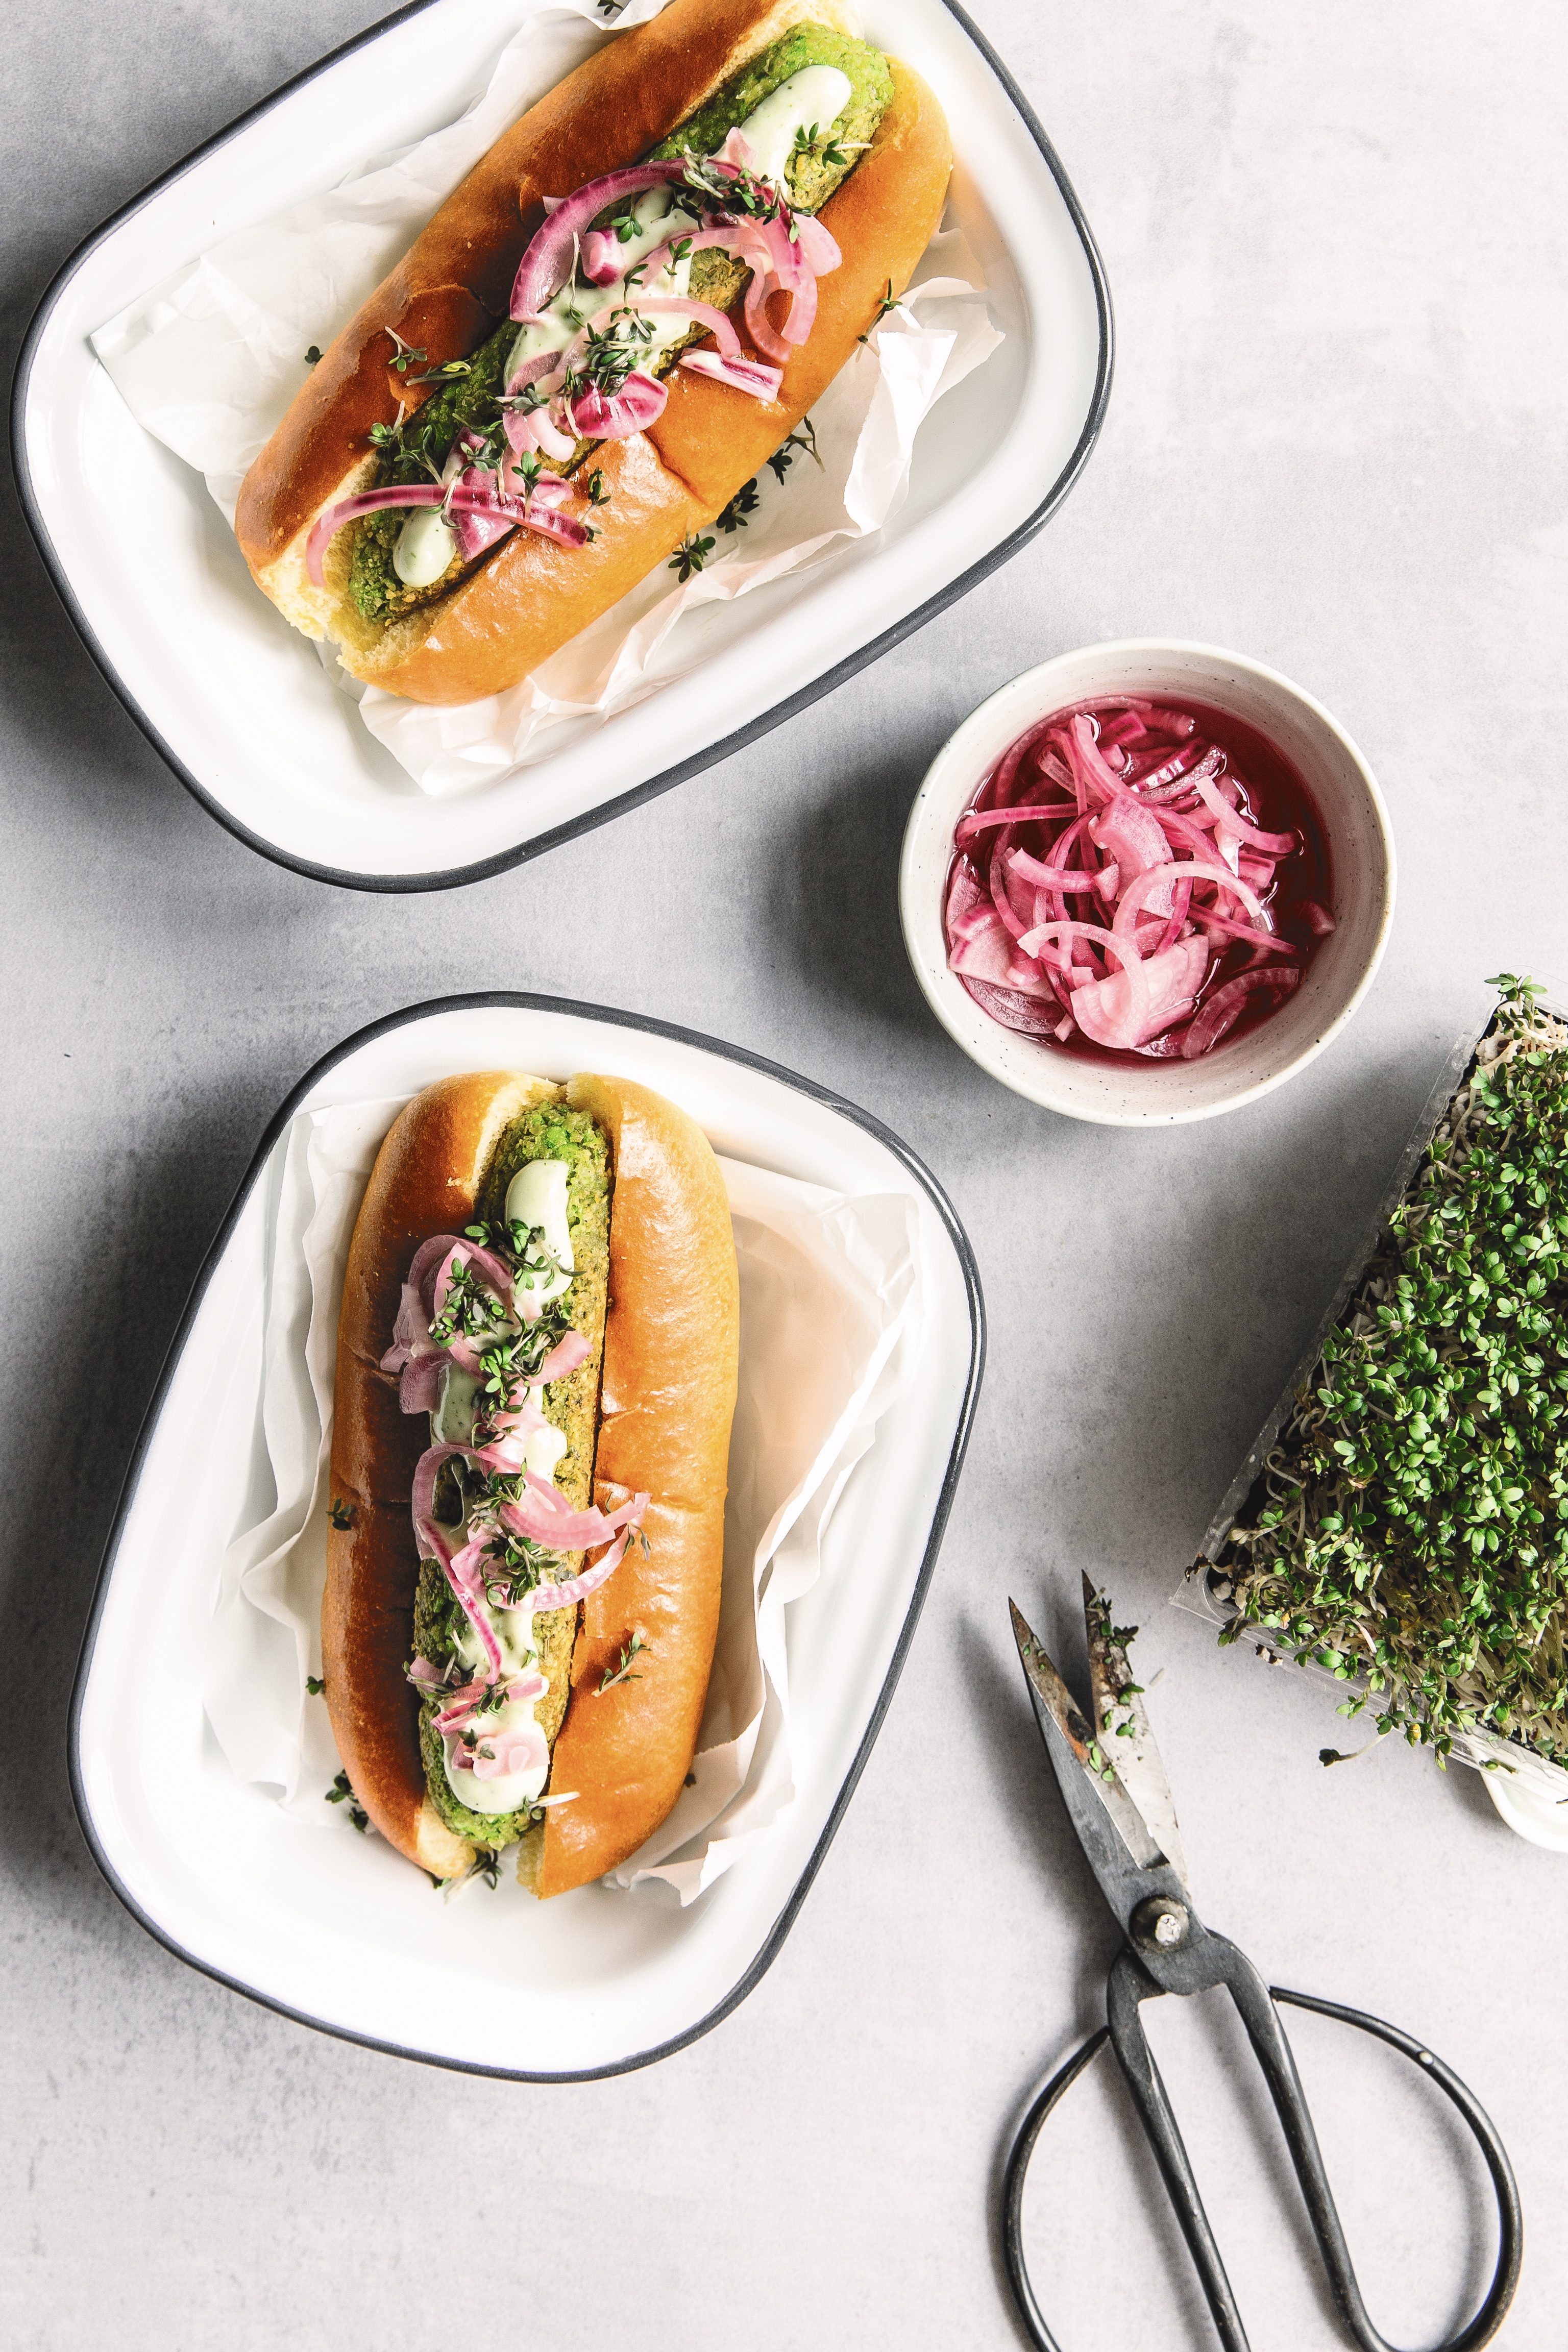 Grønne hotdogs med ærtepølser og syltede rødløg